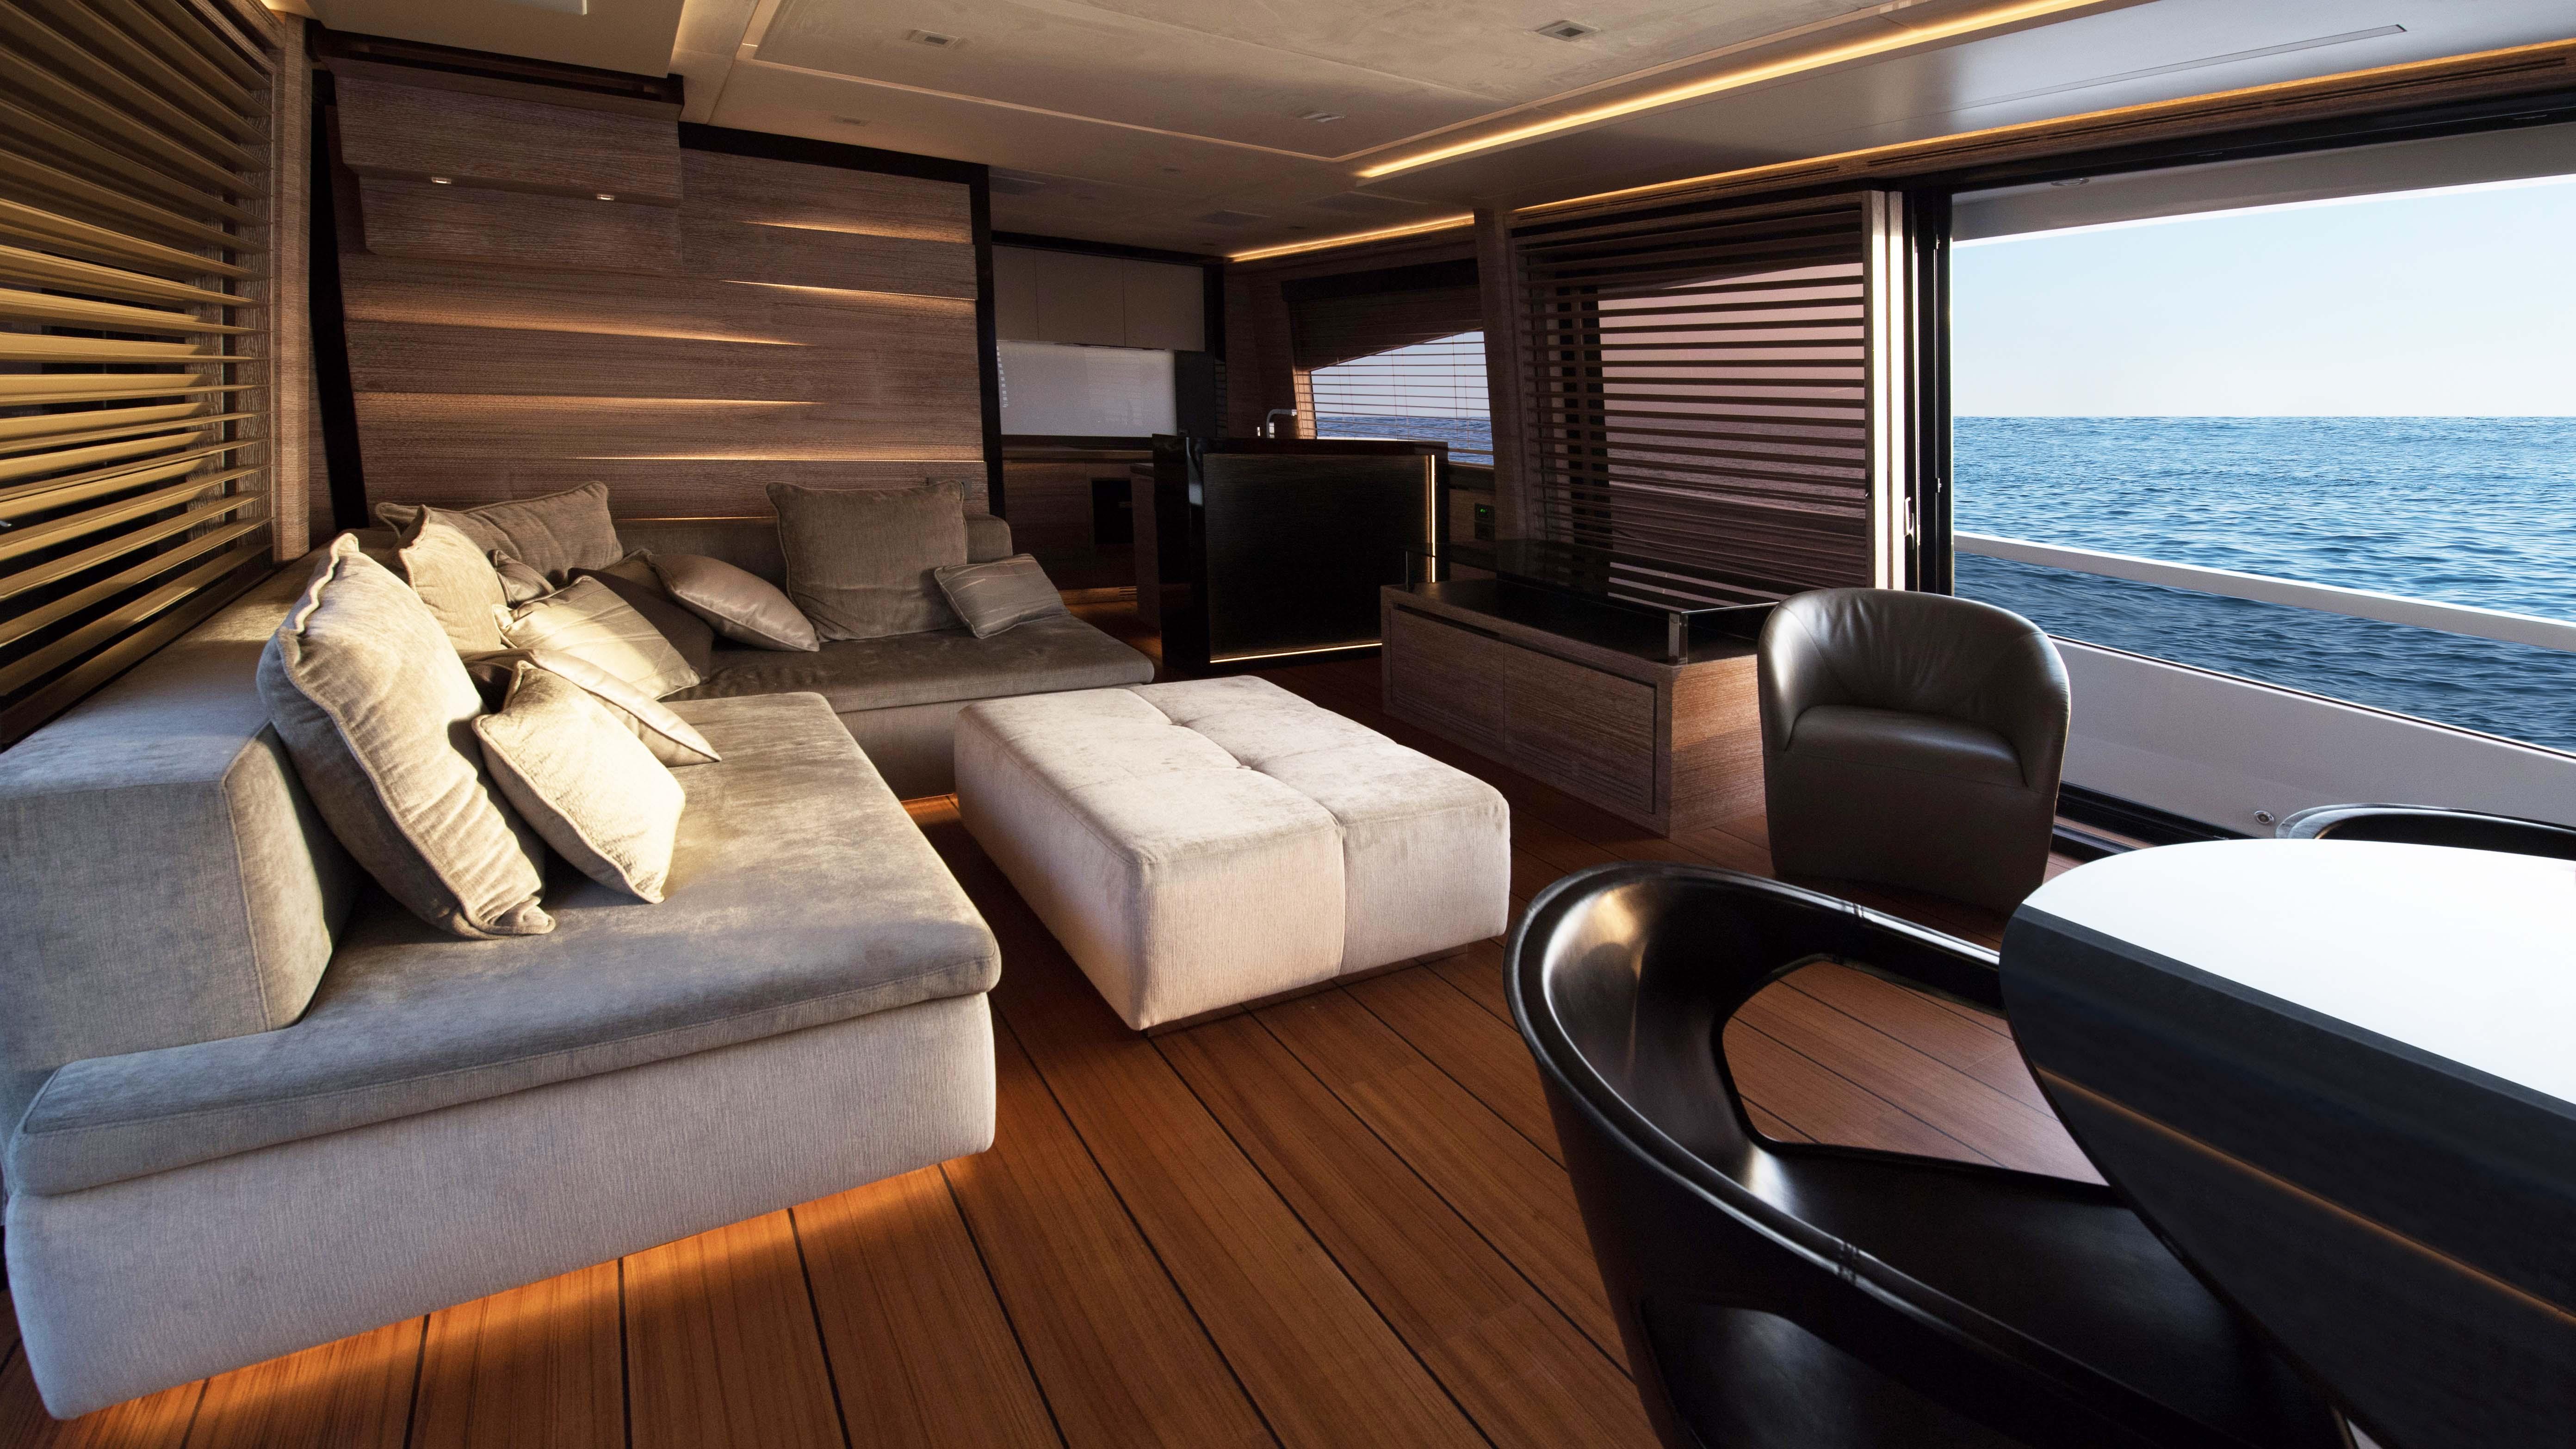 Adler Suprema Yacht superyacht